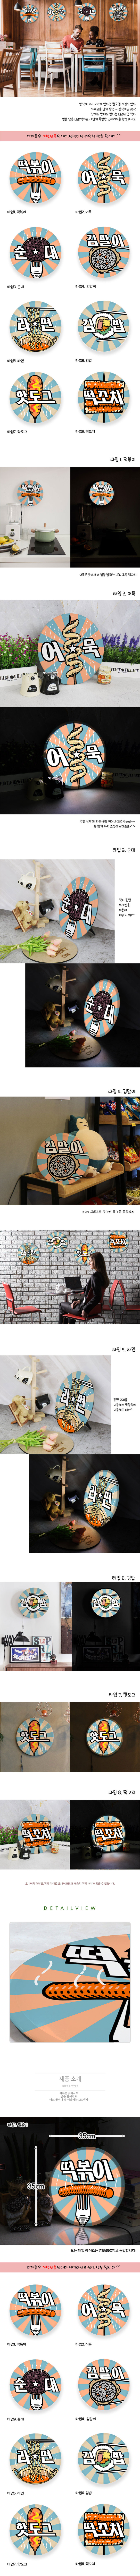 LED액자35R_분식메뉴 - 꾸밈, 59,000원, 포인트조명, 터치조명